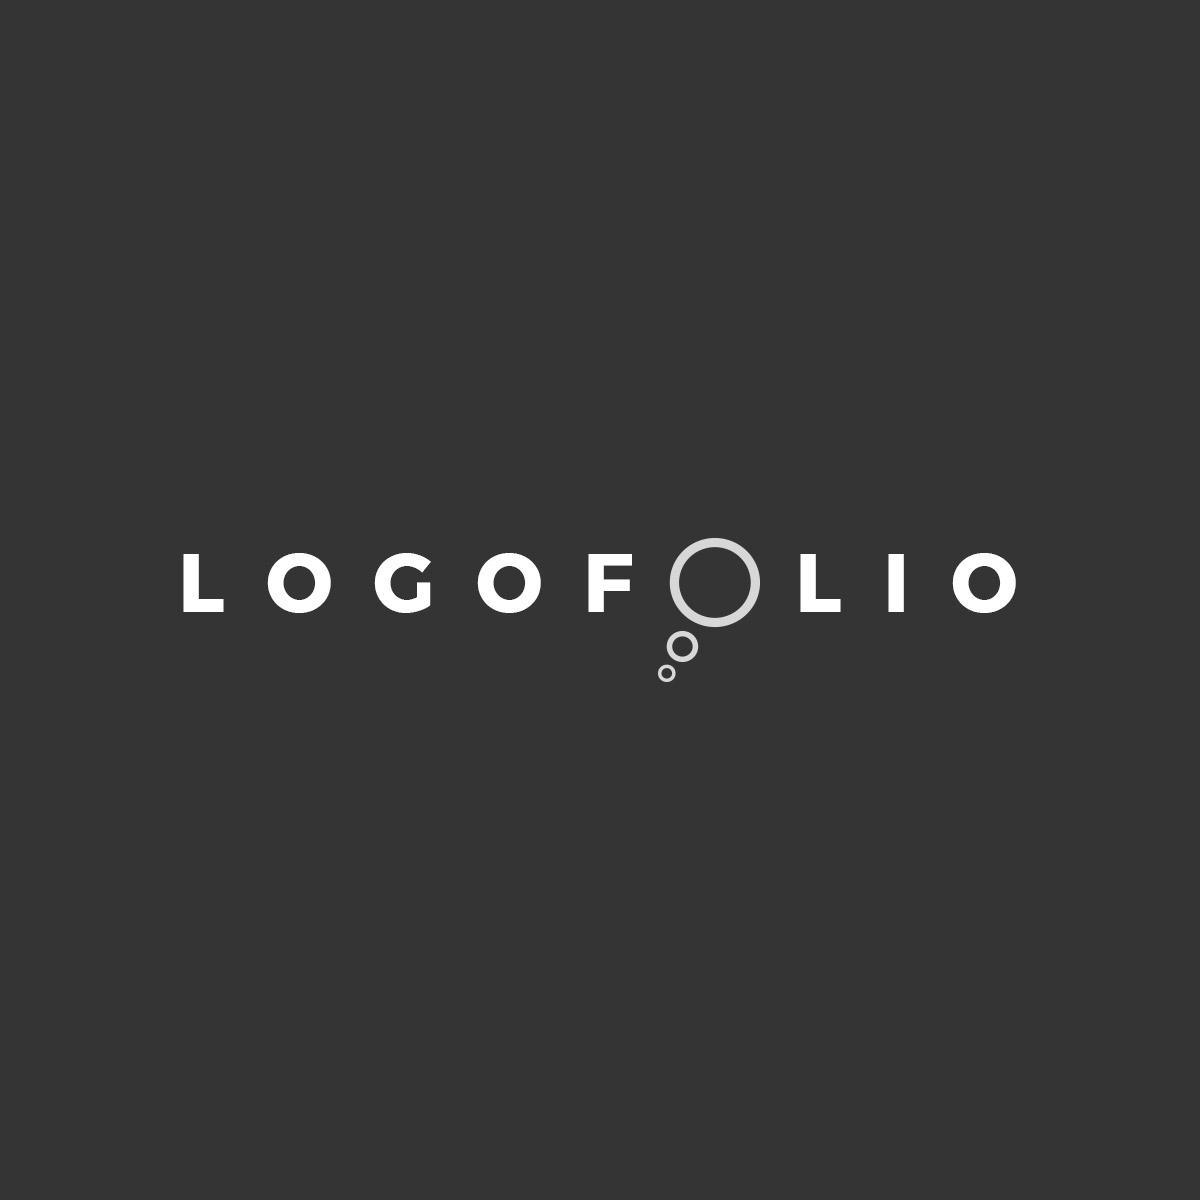 TC Logofolio